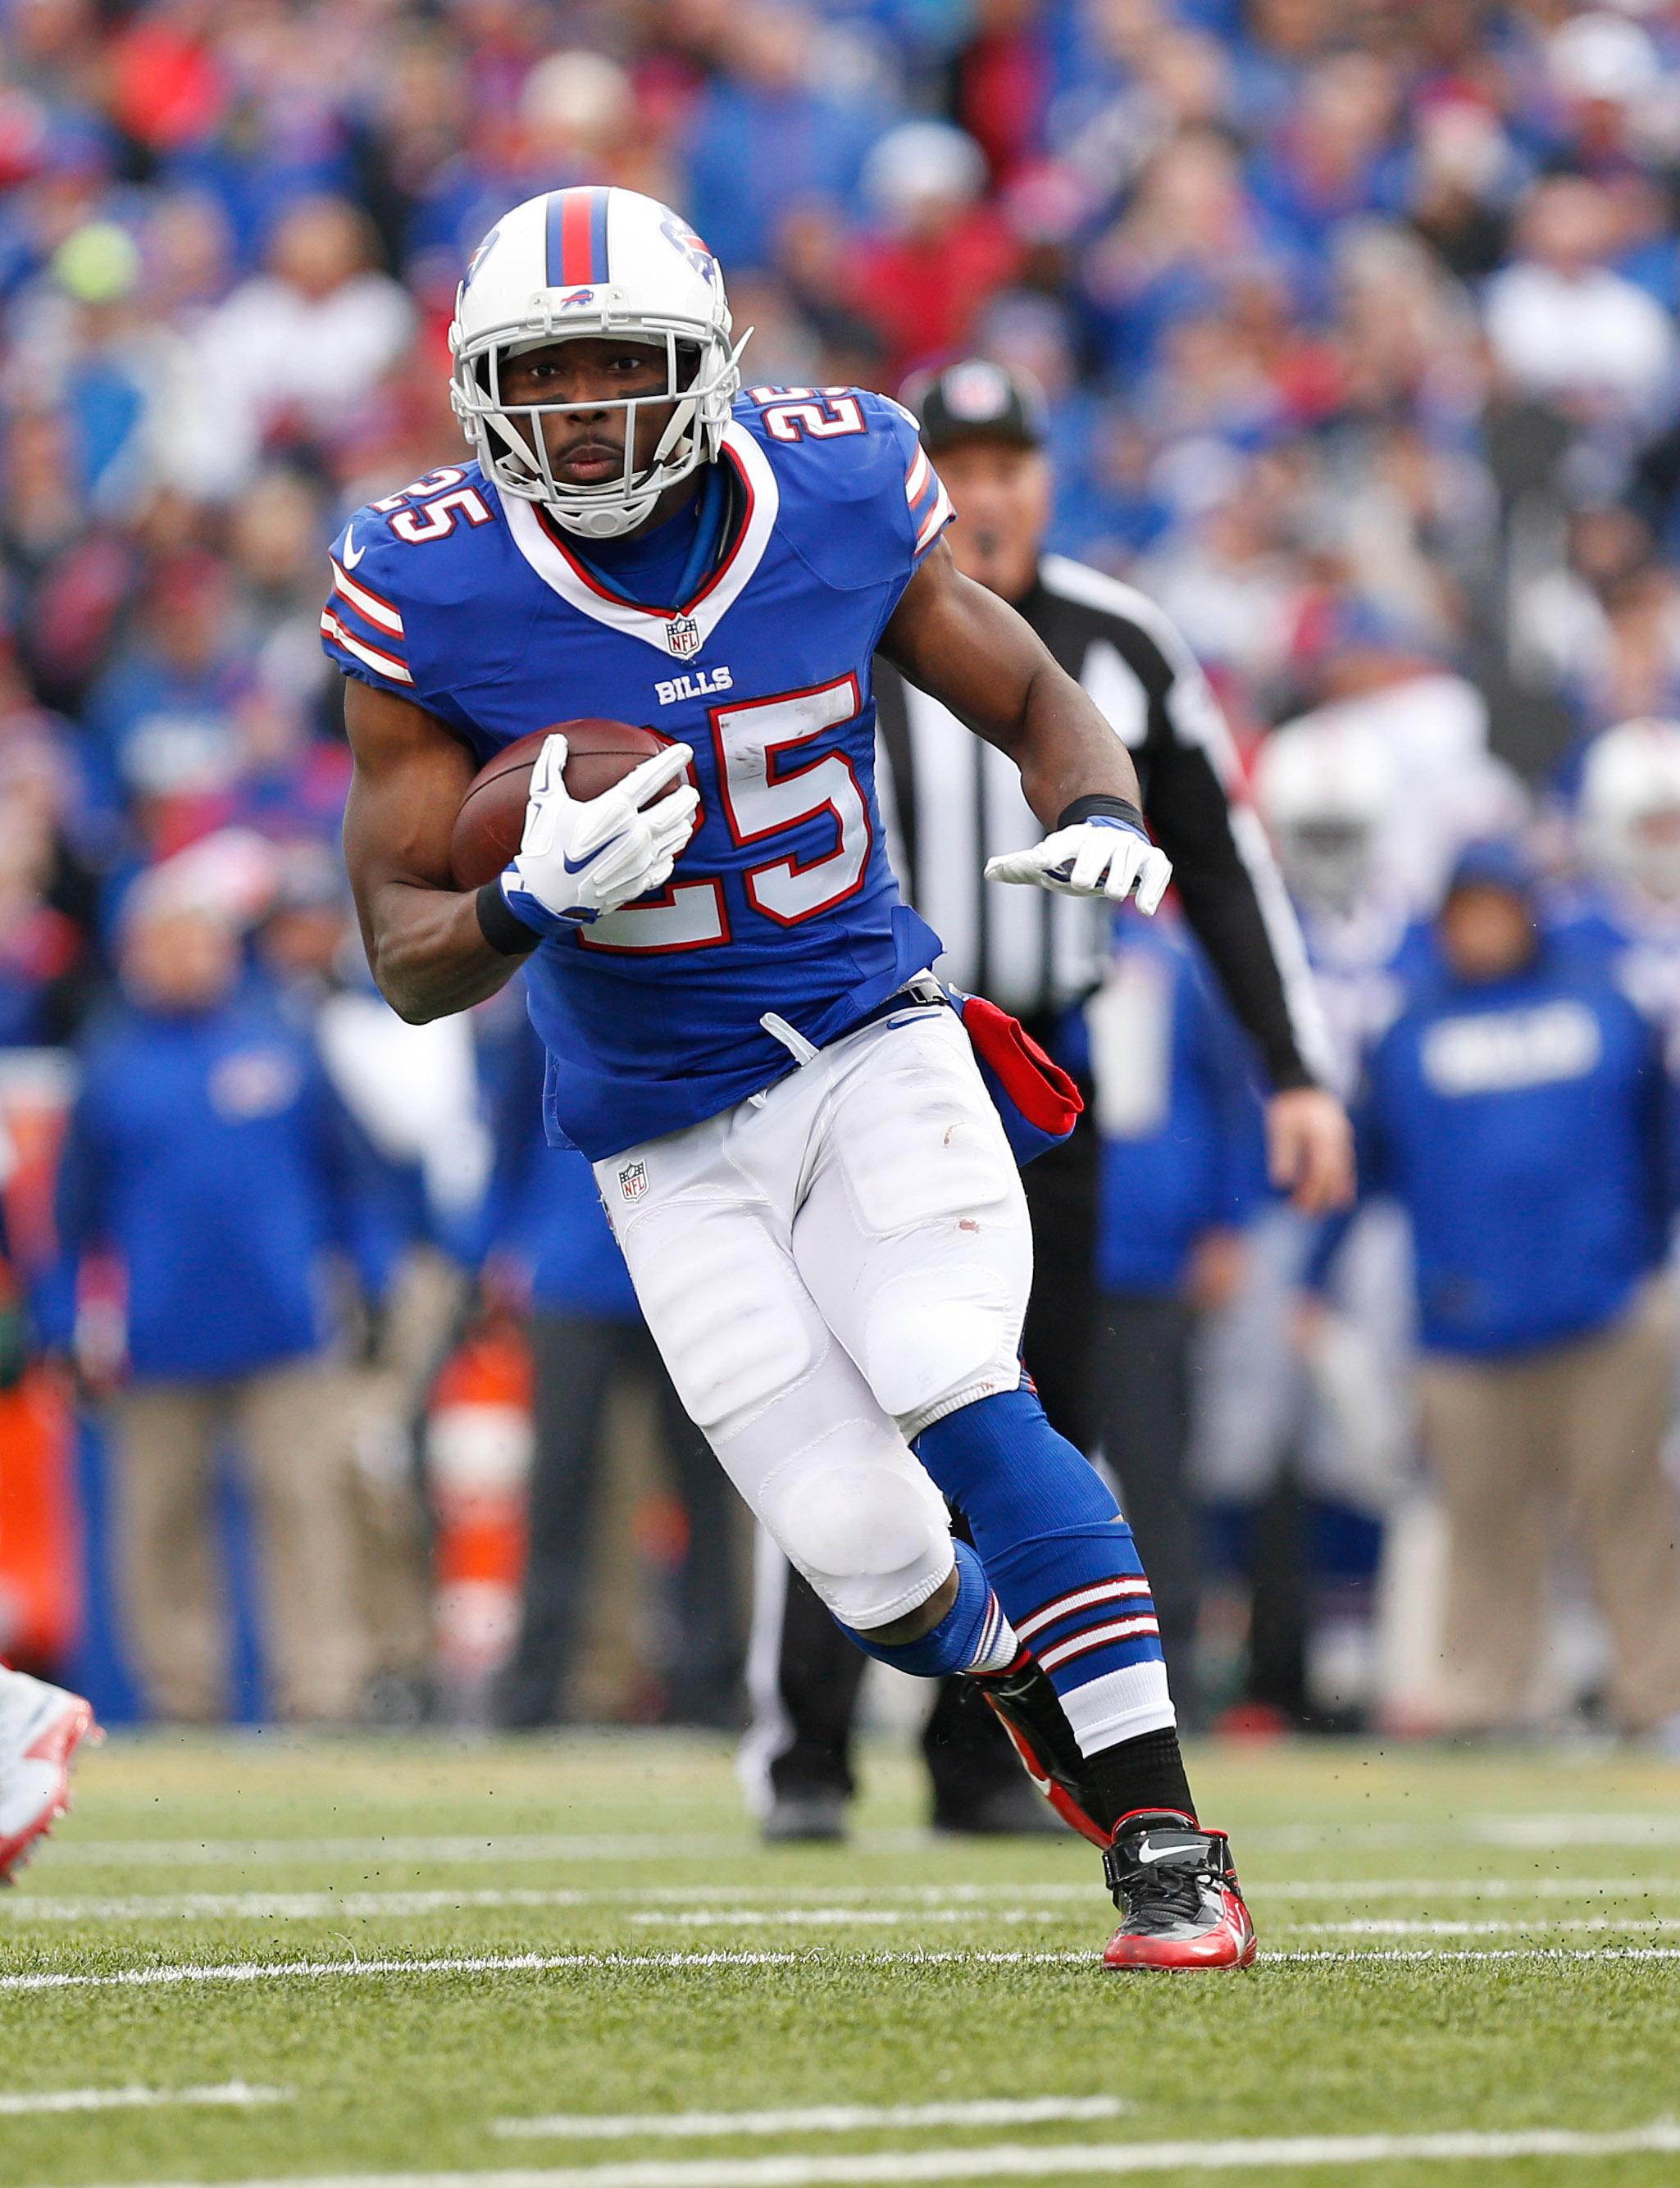 Bills Intend To Keep RB LeSean McCoy